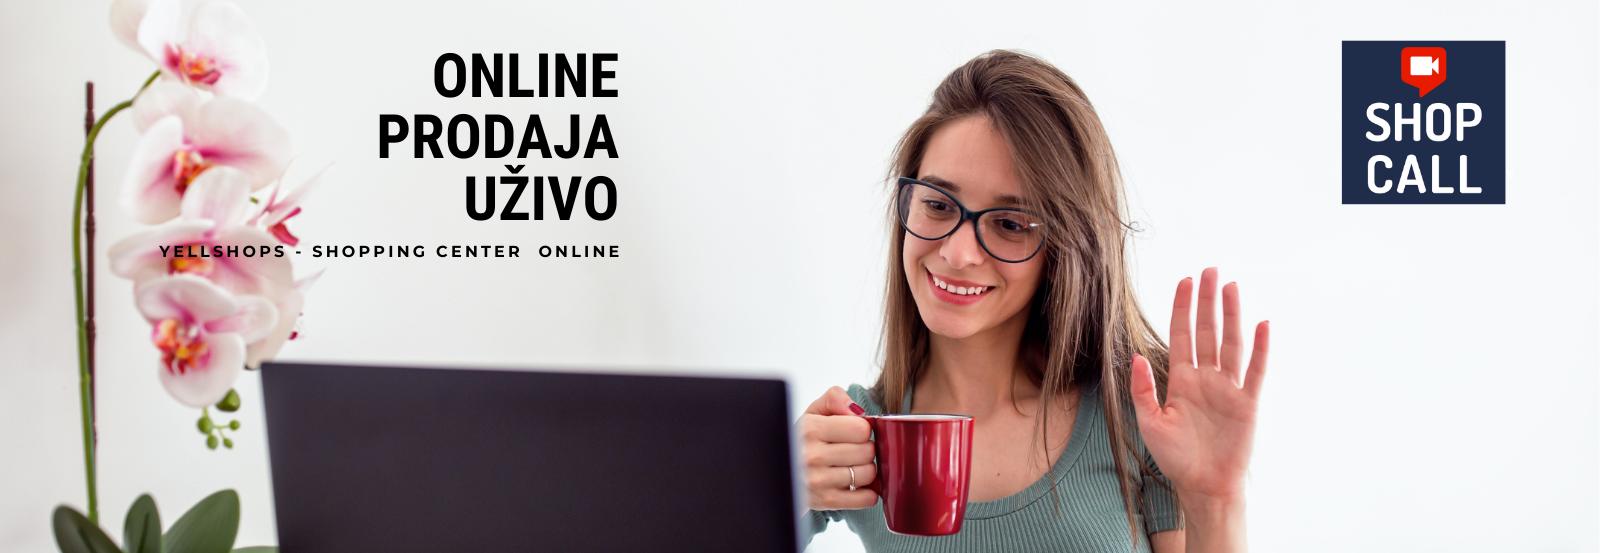 Online prodaja uzivo